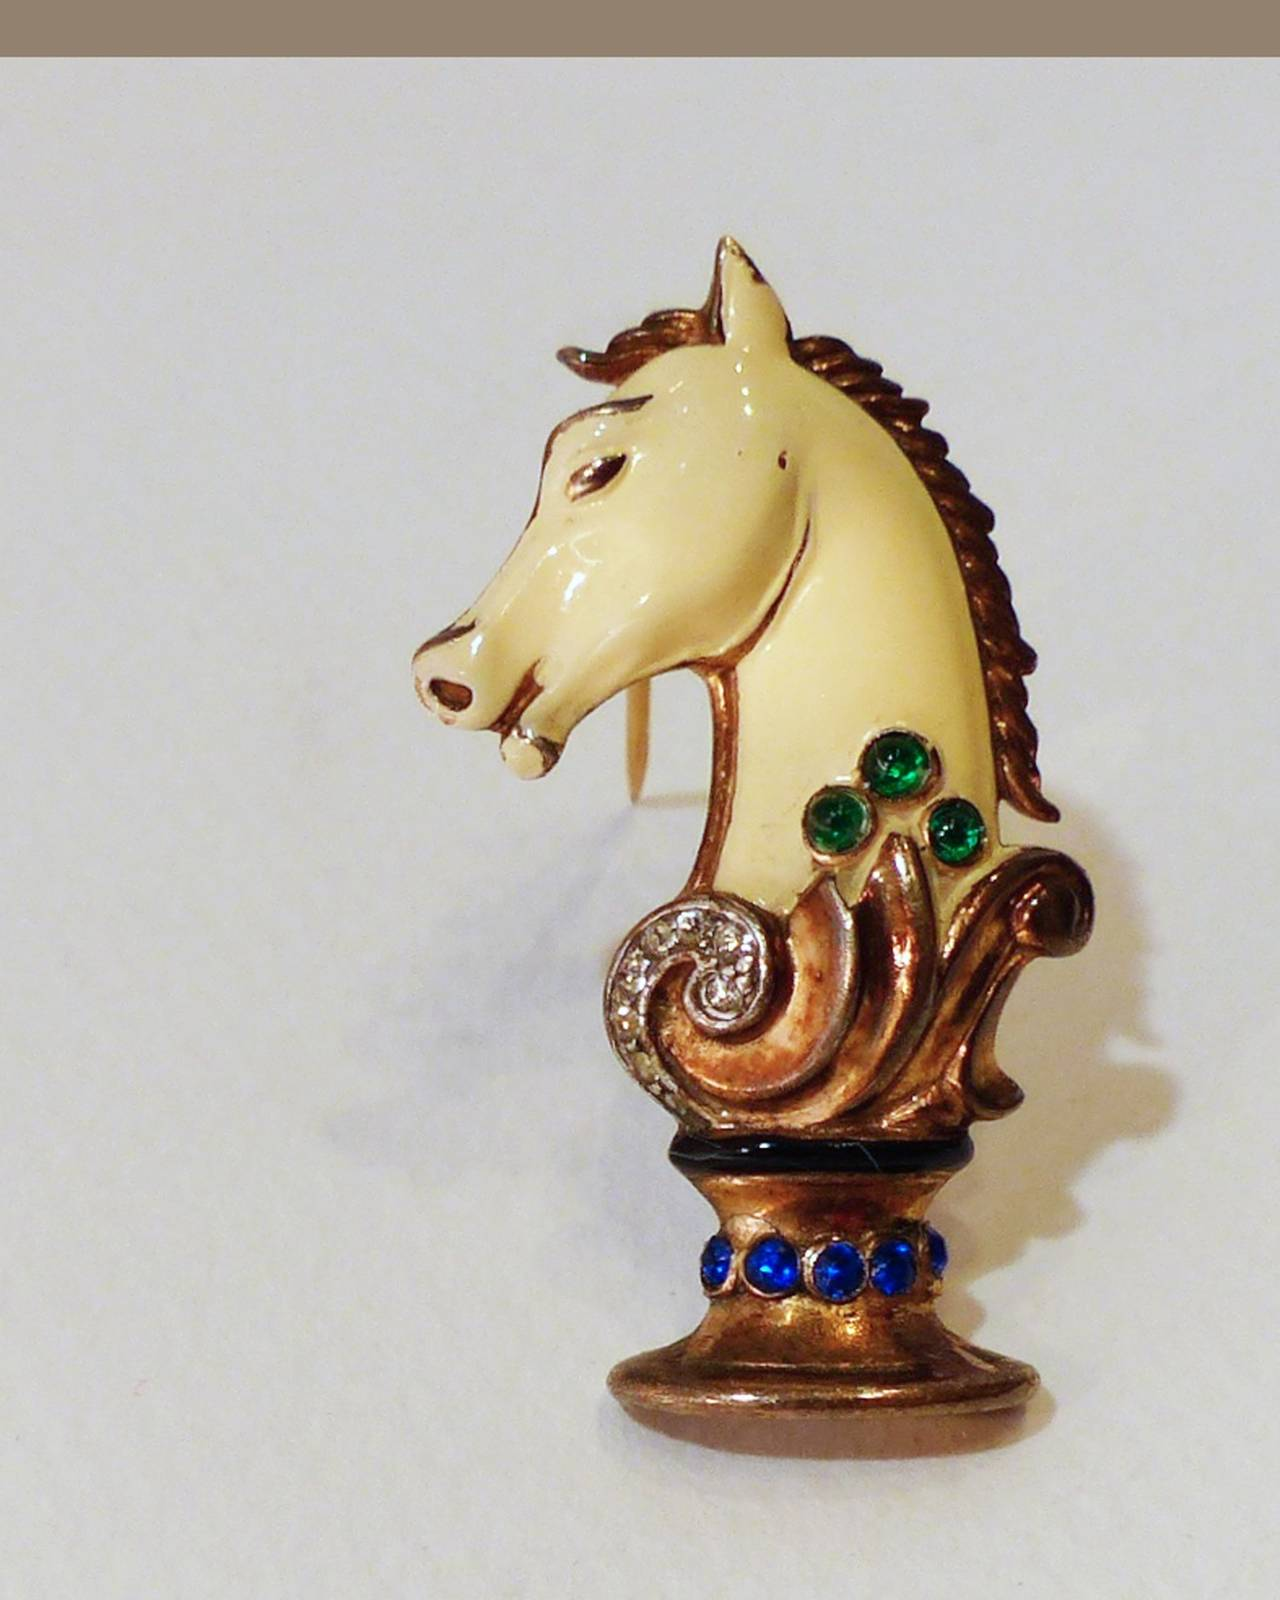 Rare Vintage 1930 S Trifari Chess Set Fur Clip Pins And